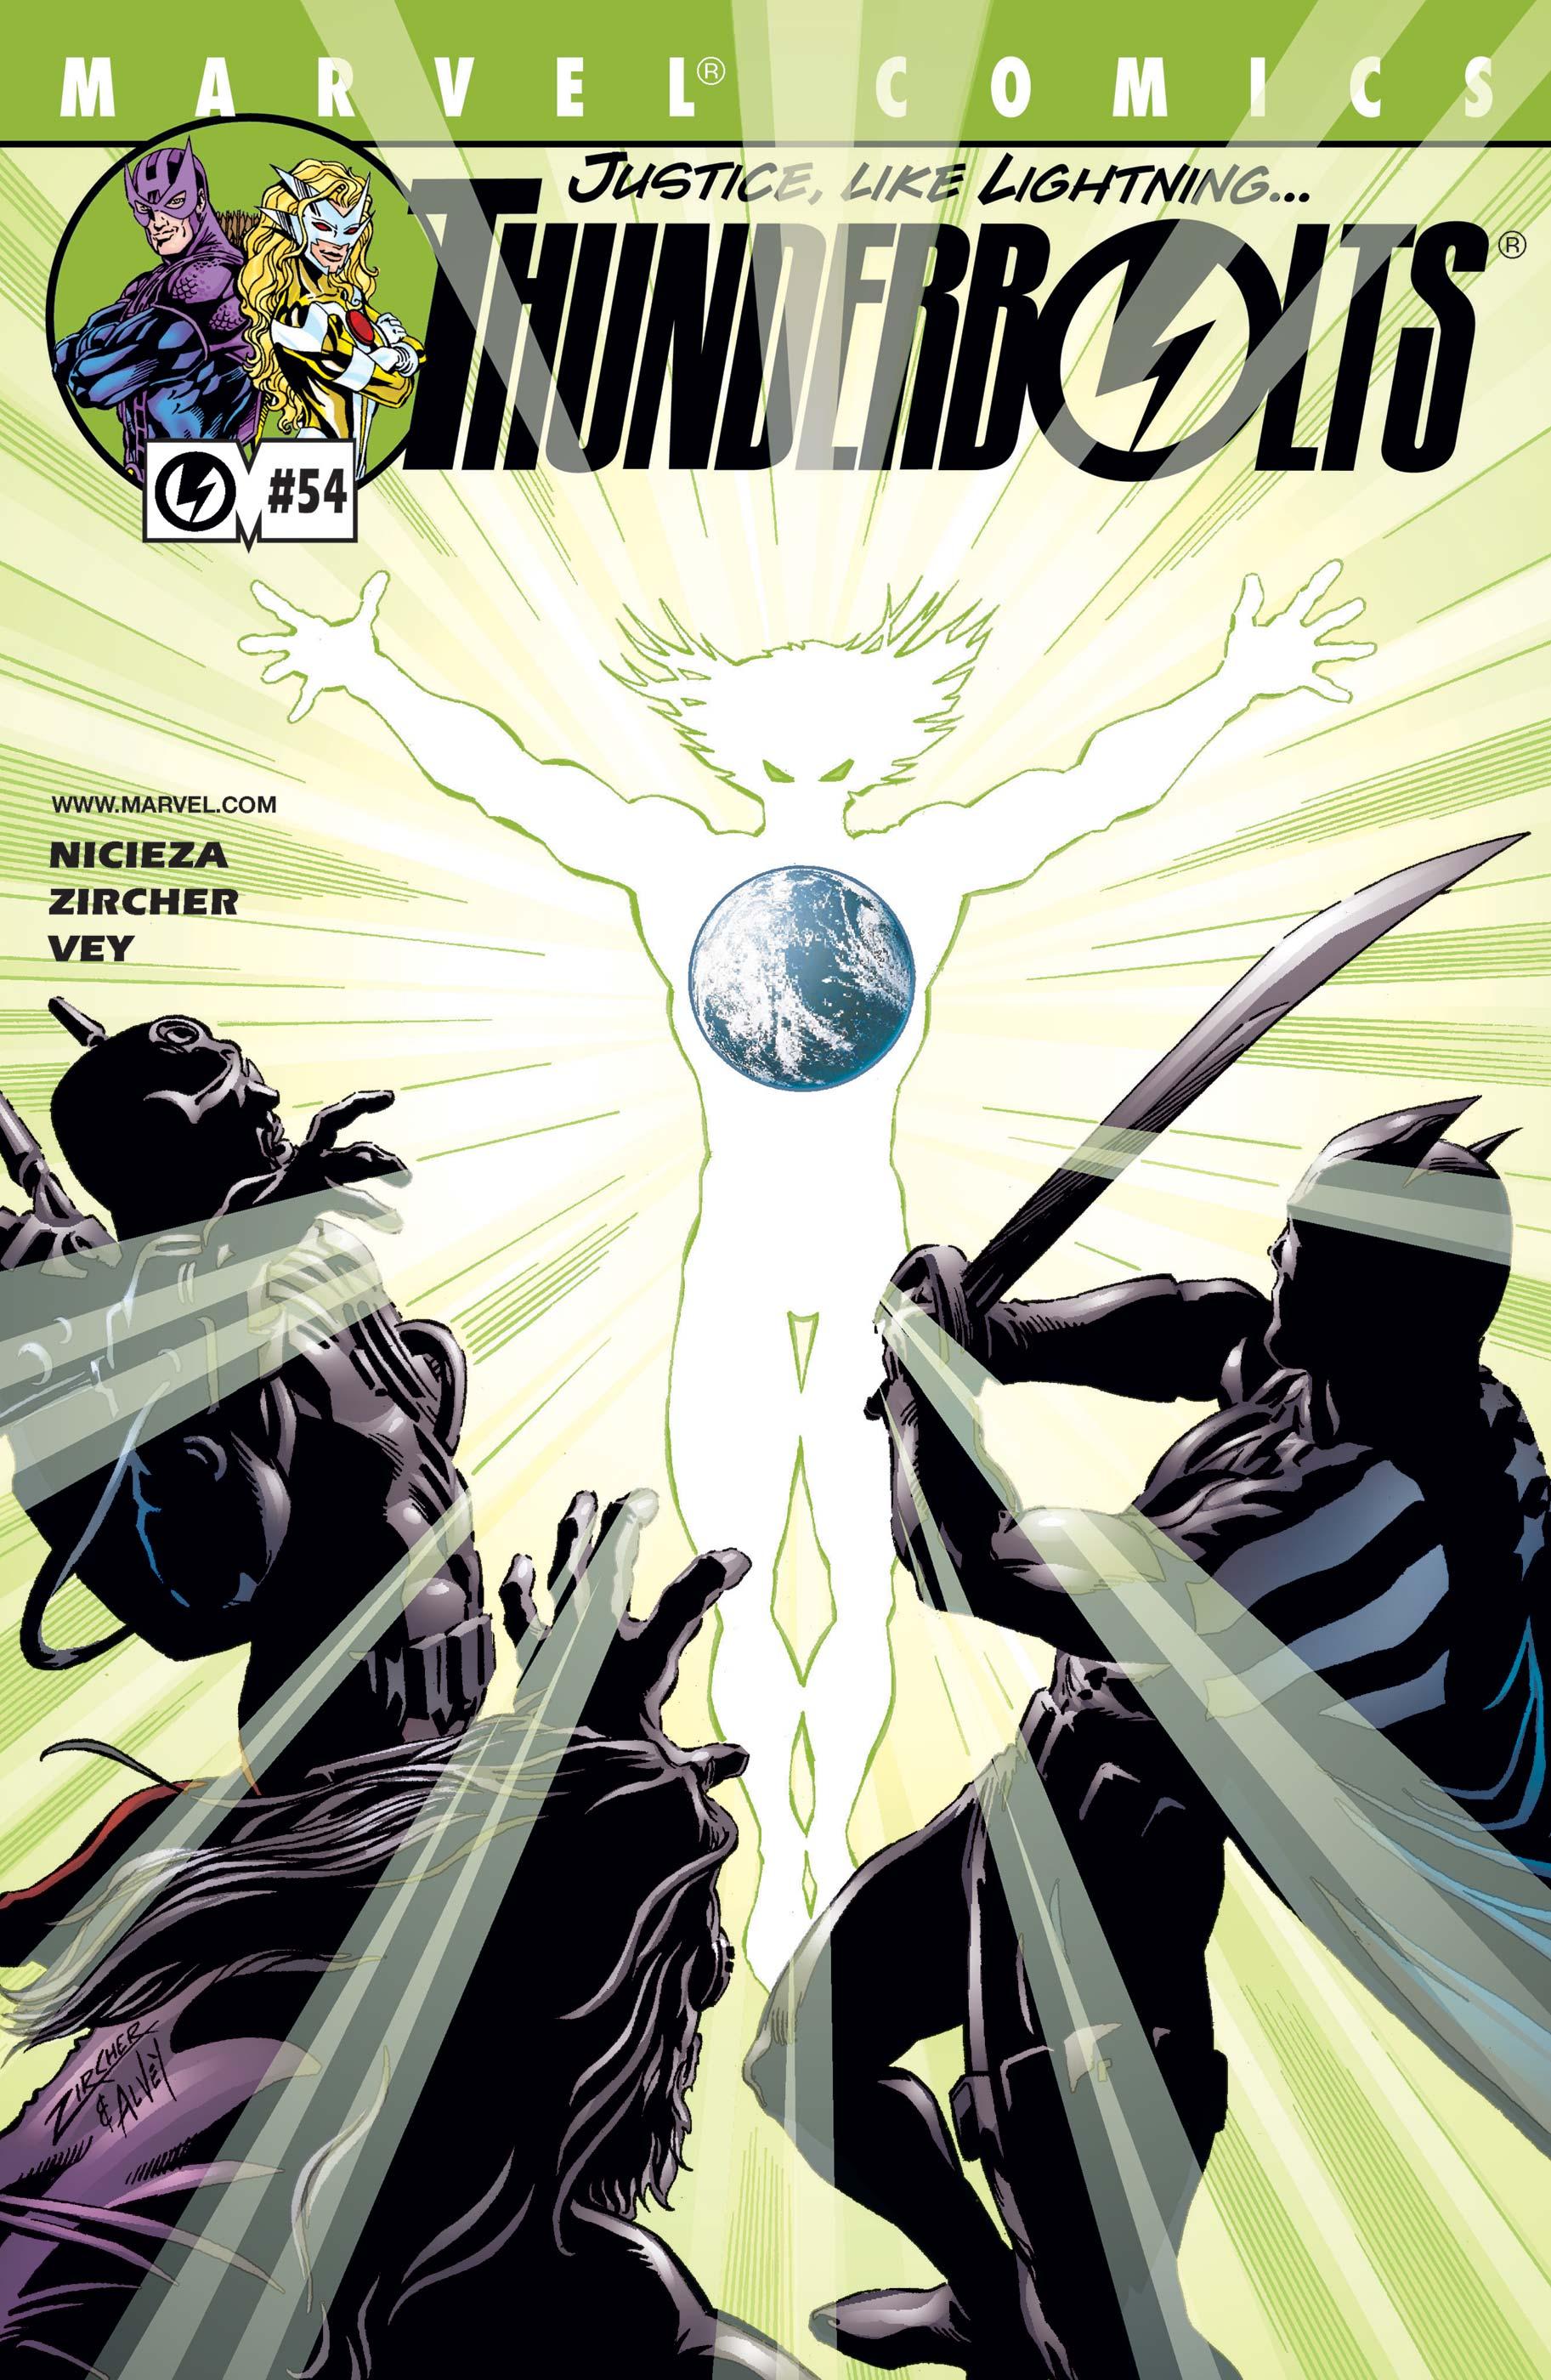 Thunderbolts (1997) #54